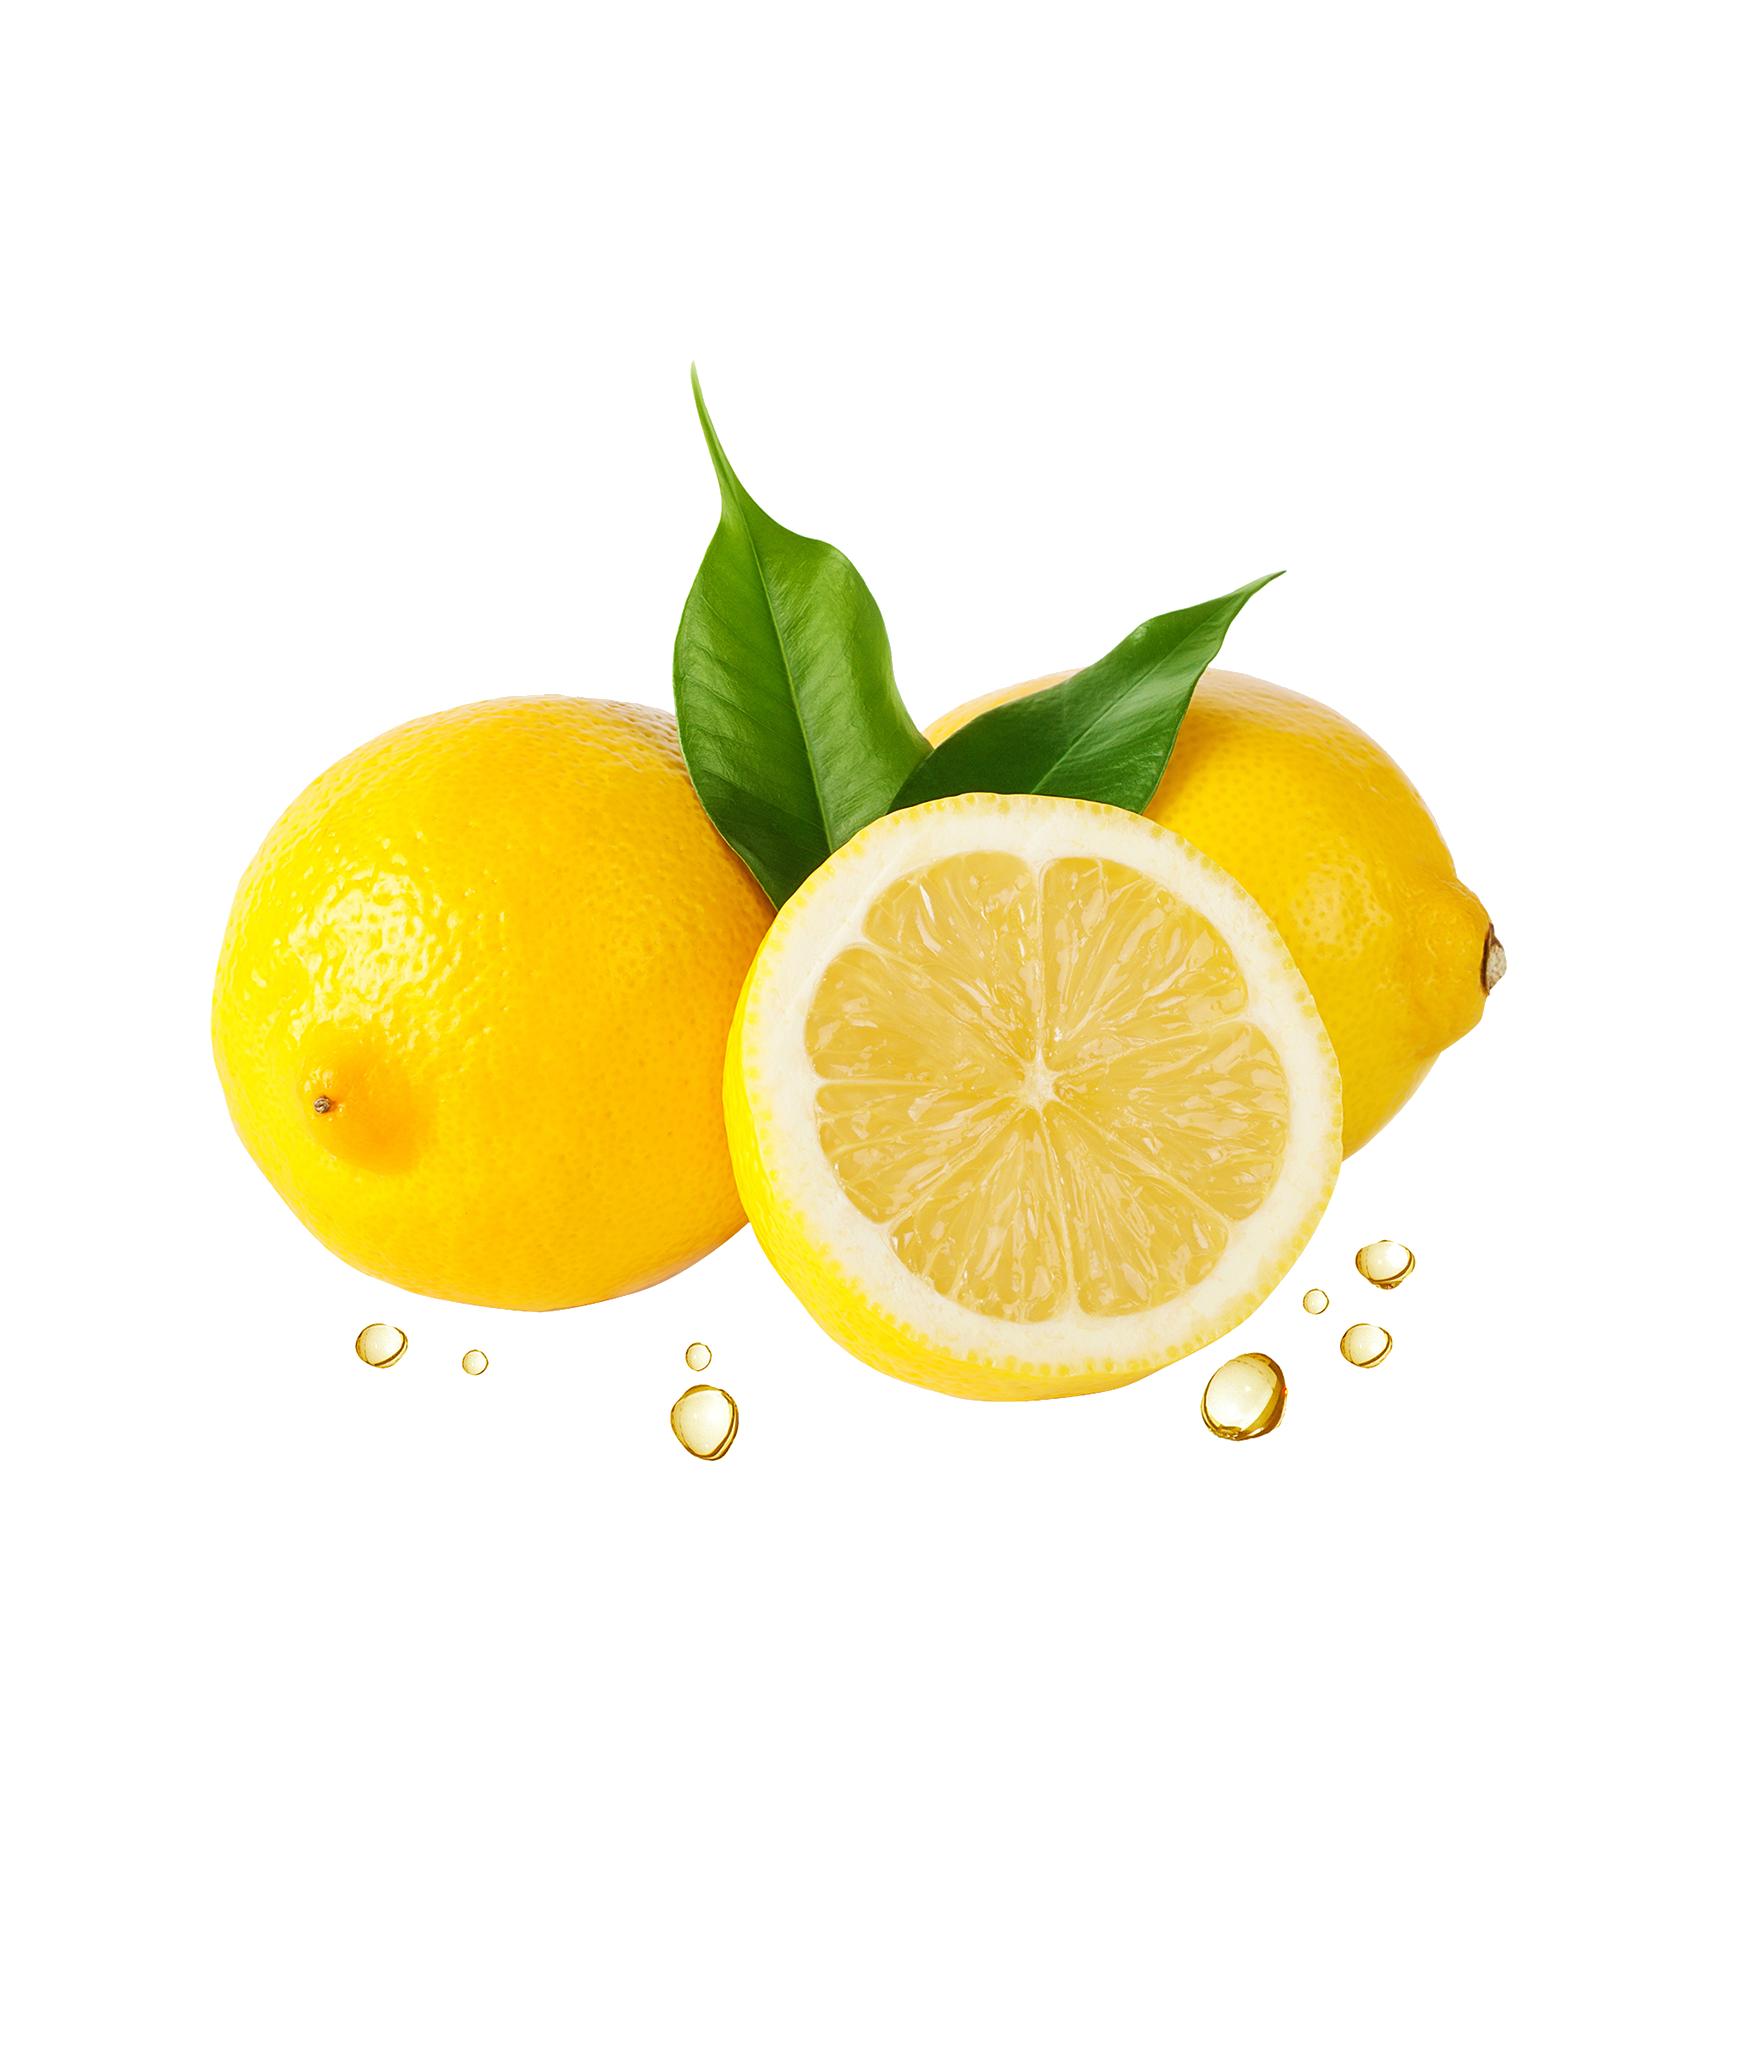 banner freeuse library Lemons clipart lemon fruit. Juice clip art png.